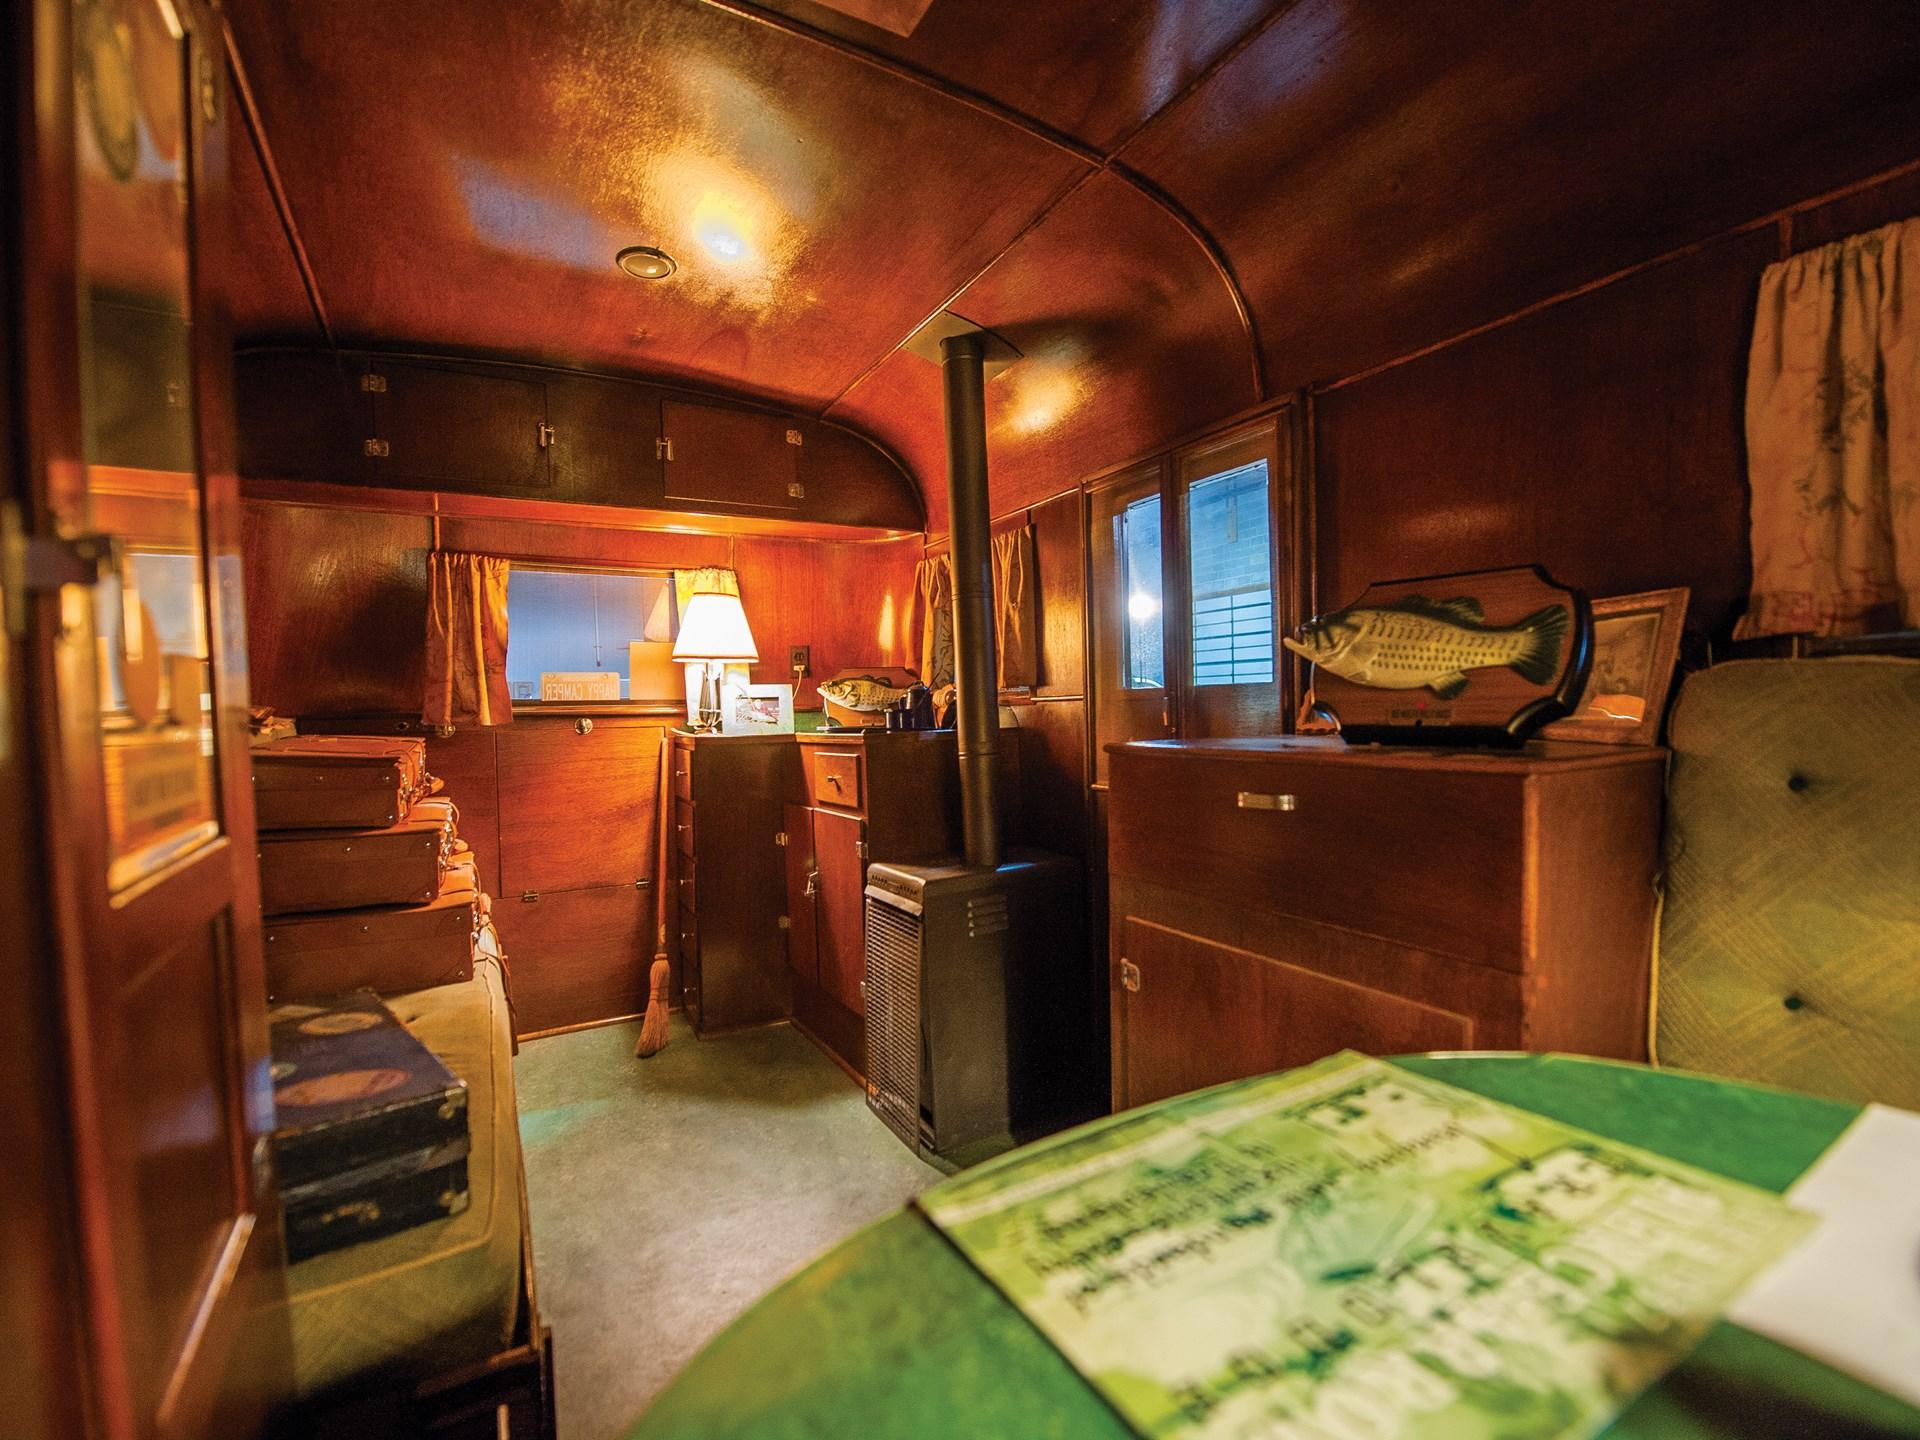 1937 Pierce-Arrow Model C Travelodge interior kitchenette